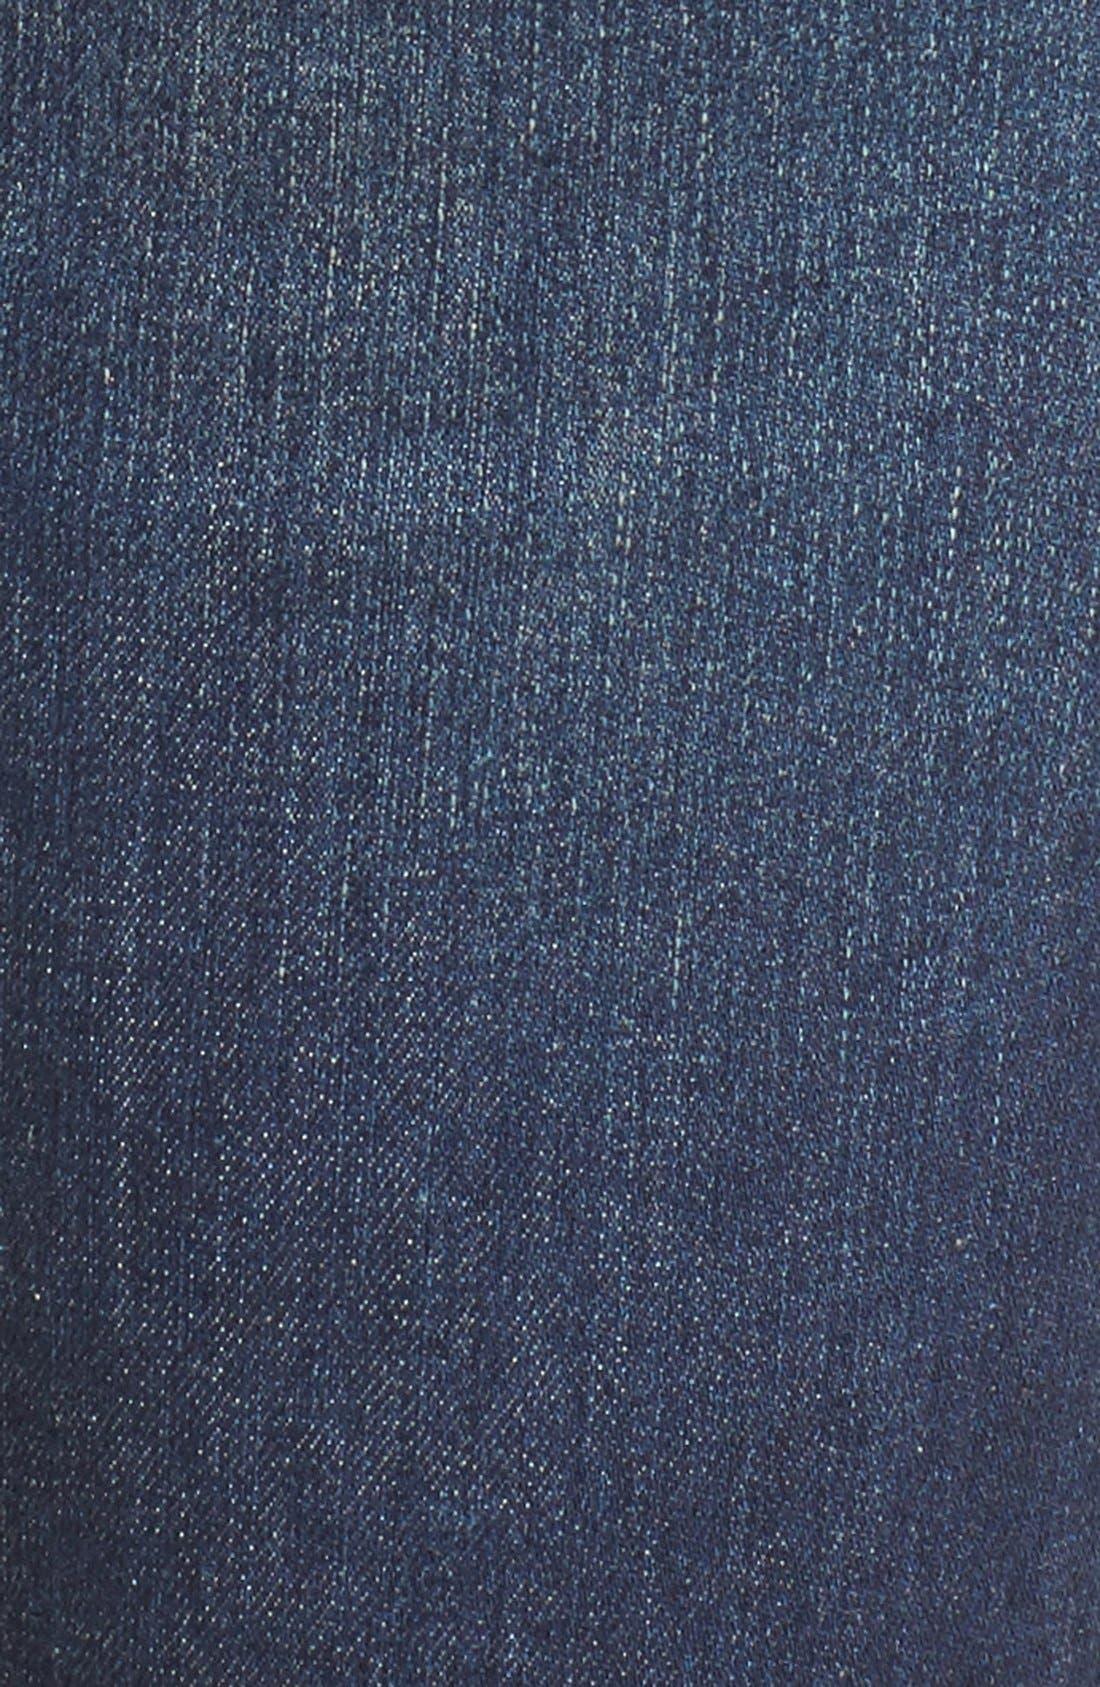 Rocket High Waist Crop Skinny Jeans,                             Alternate thumbnail 6, color,                             410